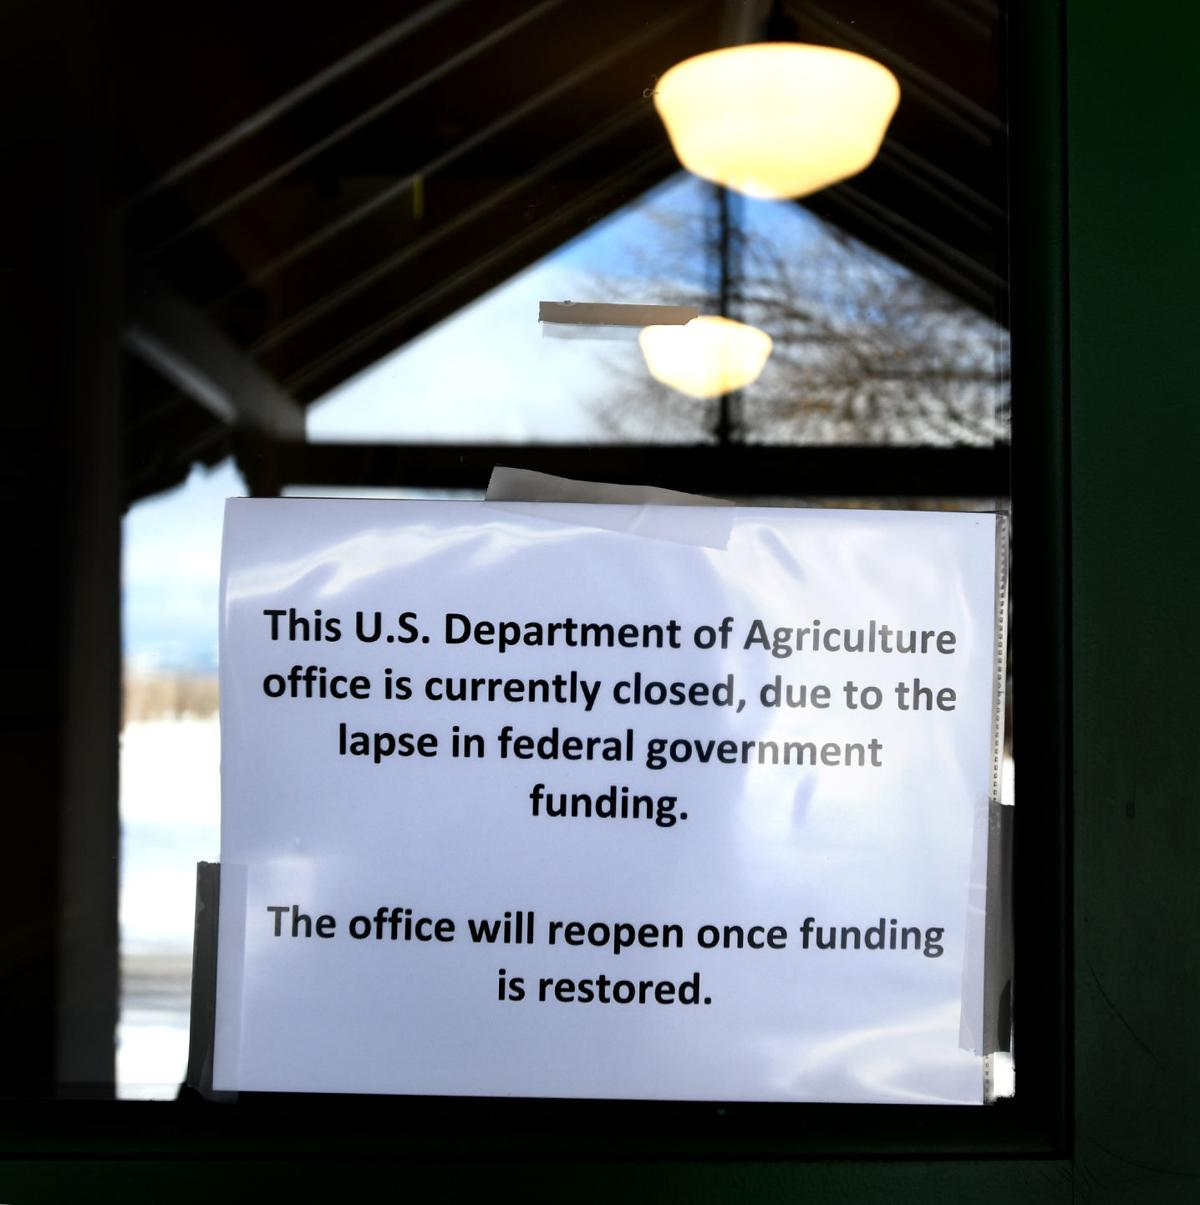 011119 govt shutdown2 kw.jpg